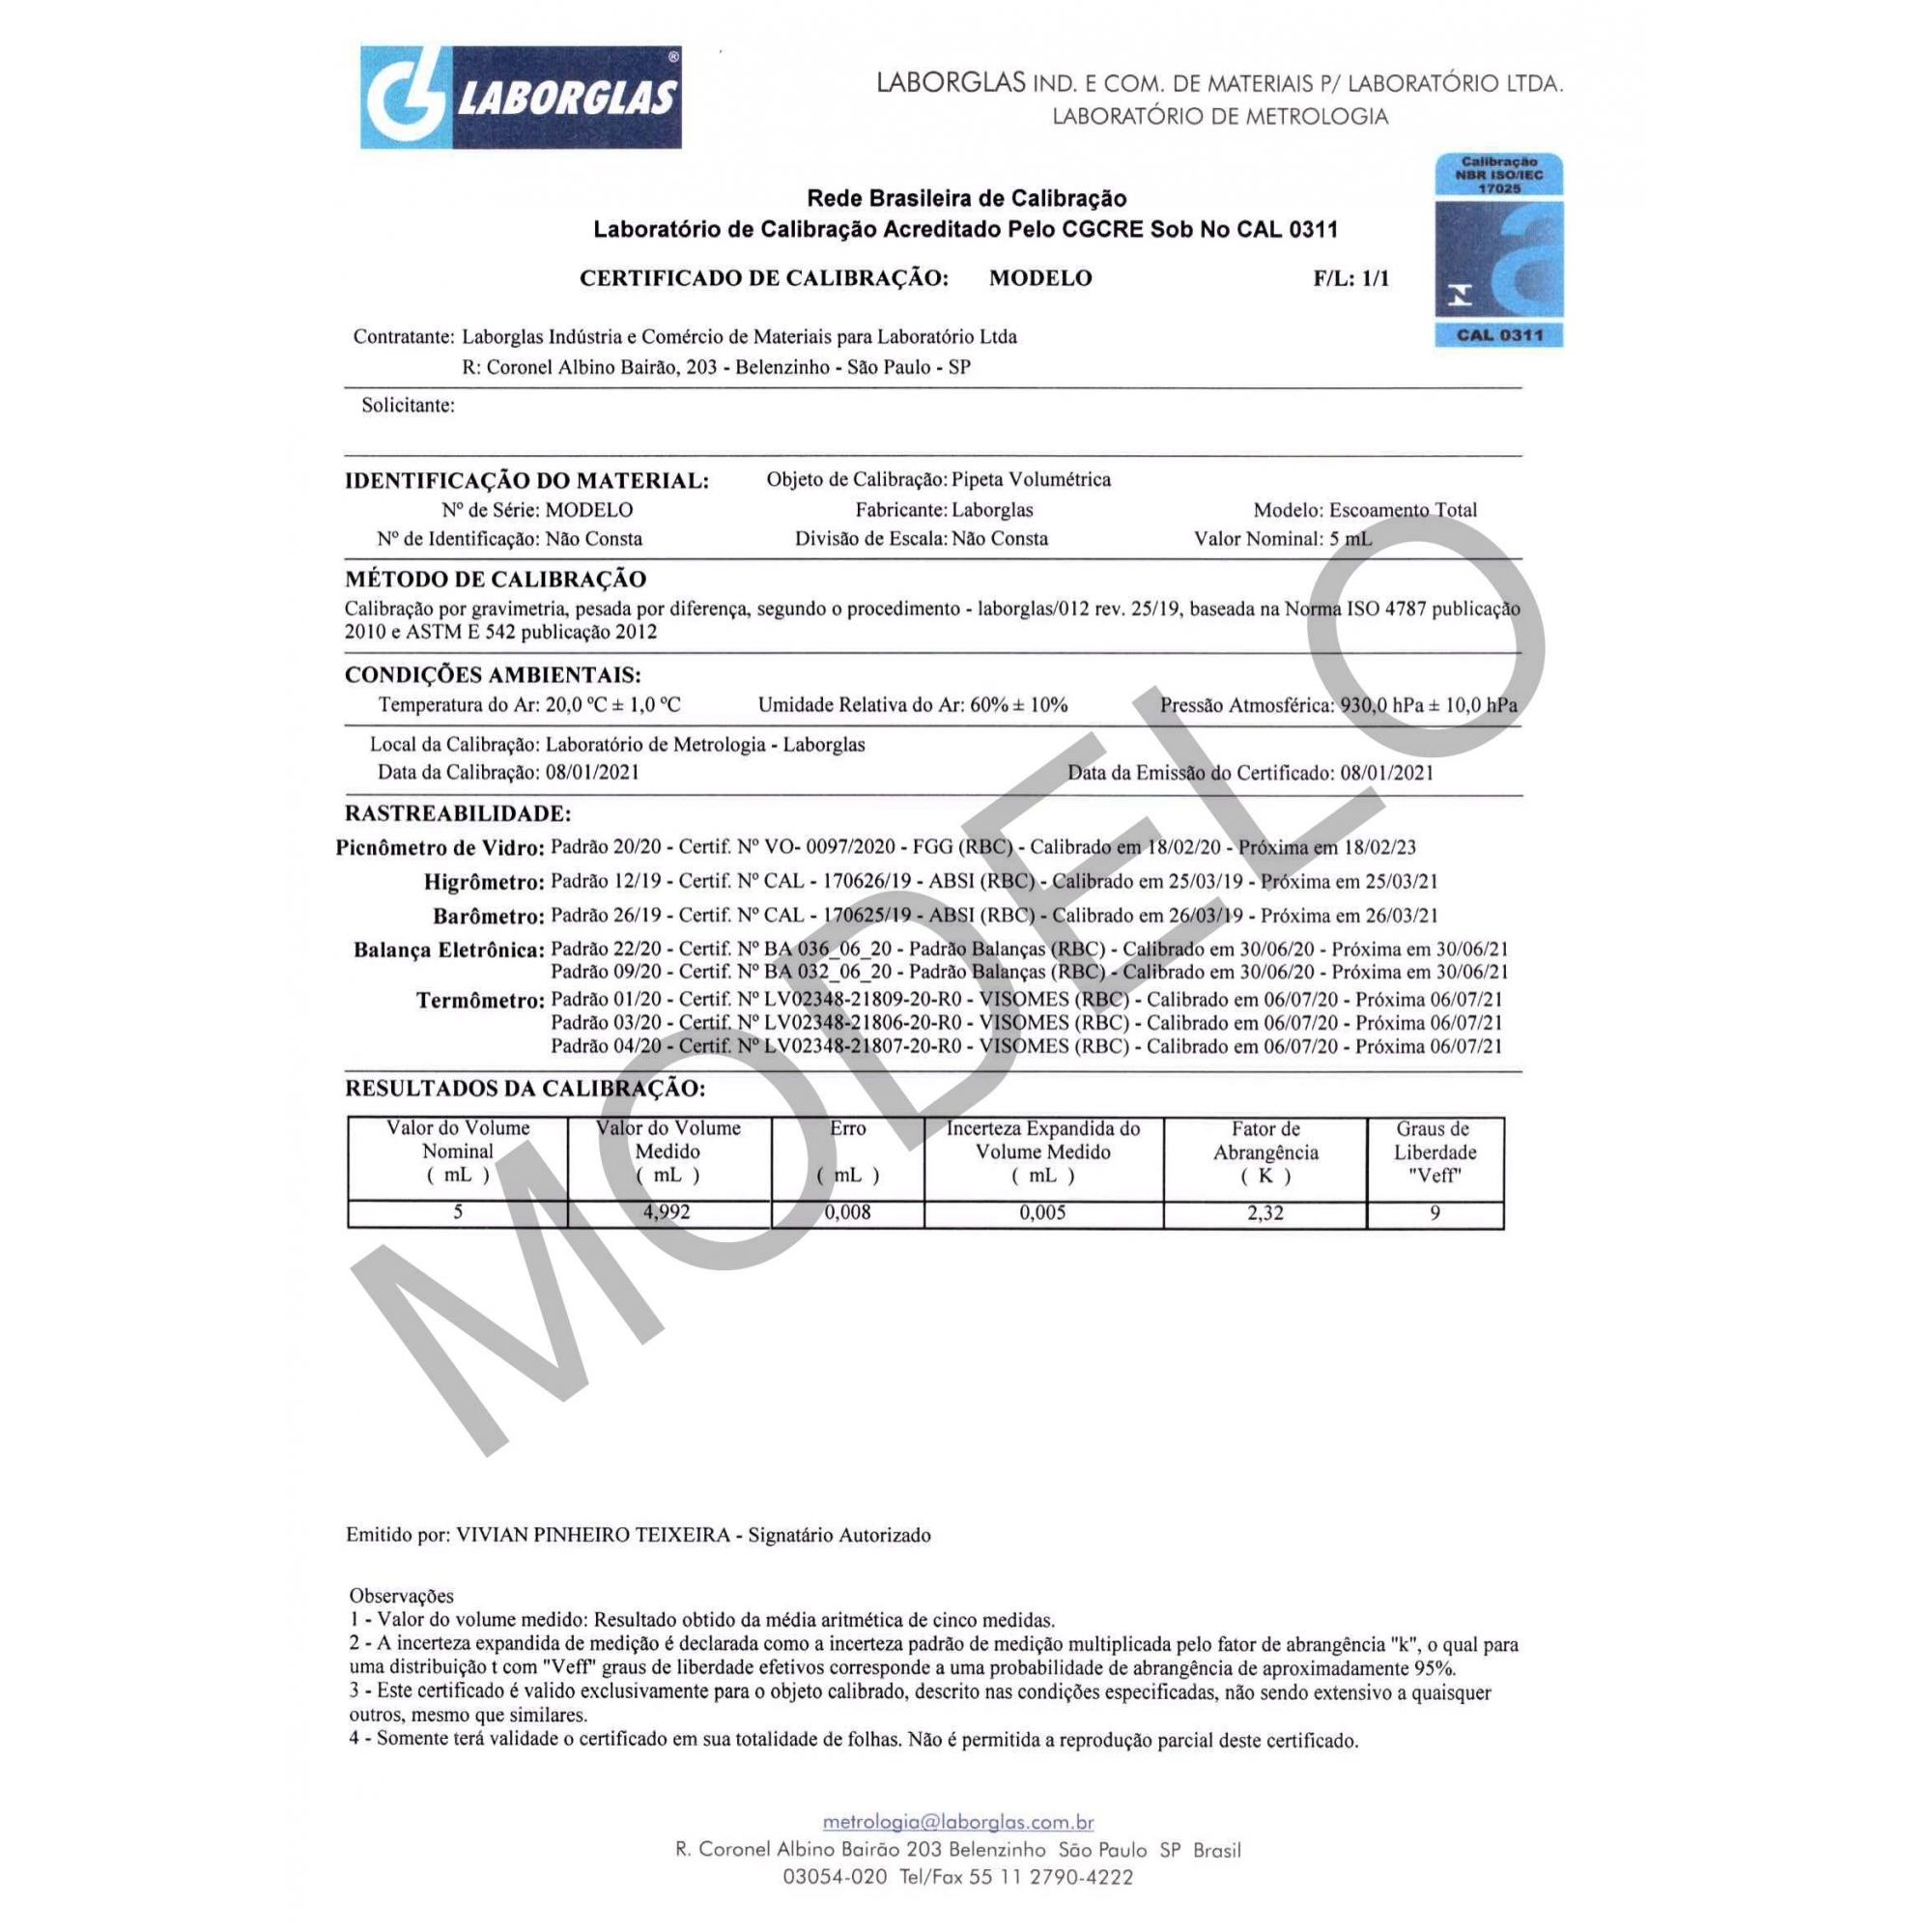 PIPETA VOLUMÉTRICA ESGOTAMENTO TOTAL 2,5 ML CERTIFICADO RBC - Laborglas - Cód. 9433720-R